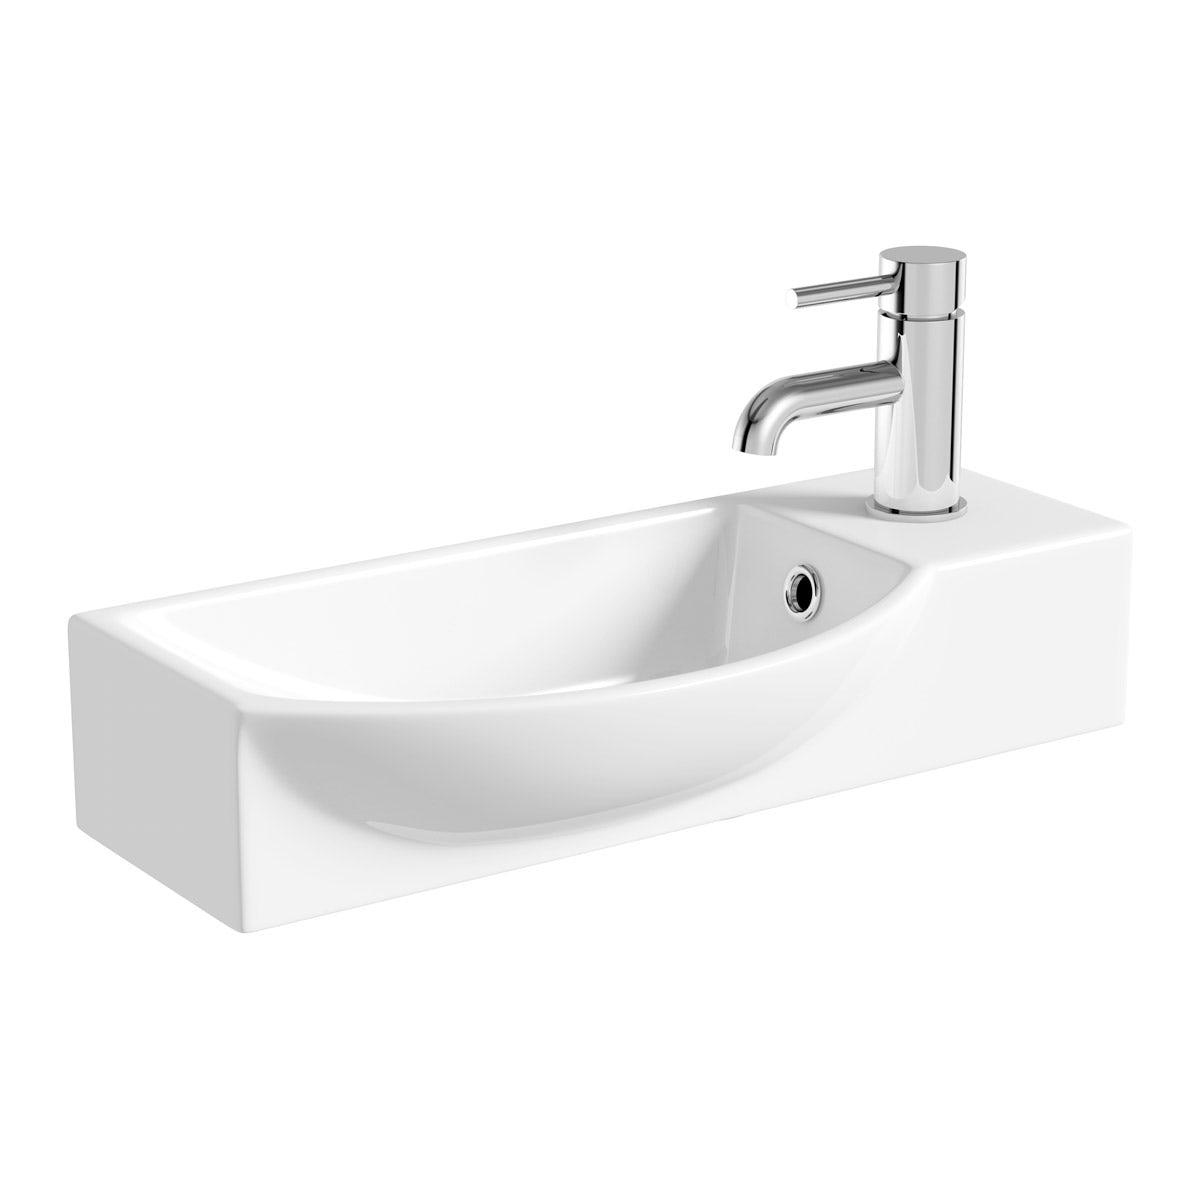 Constance basin 550mm